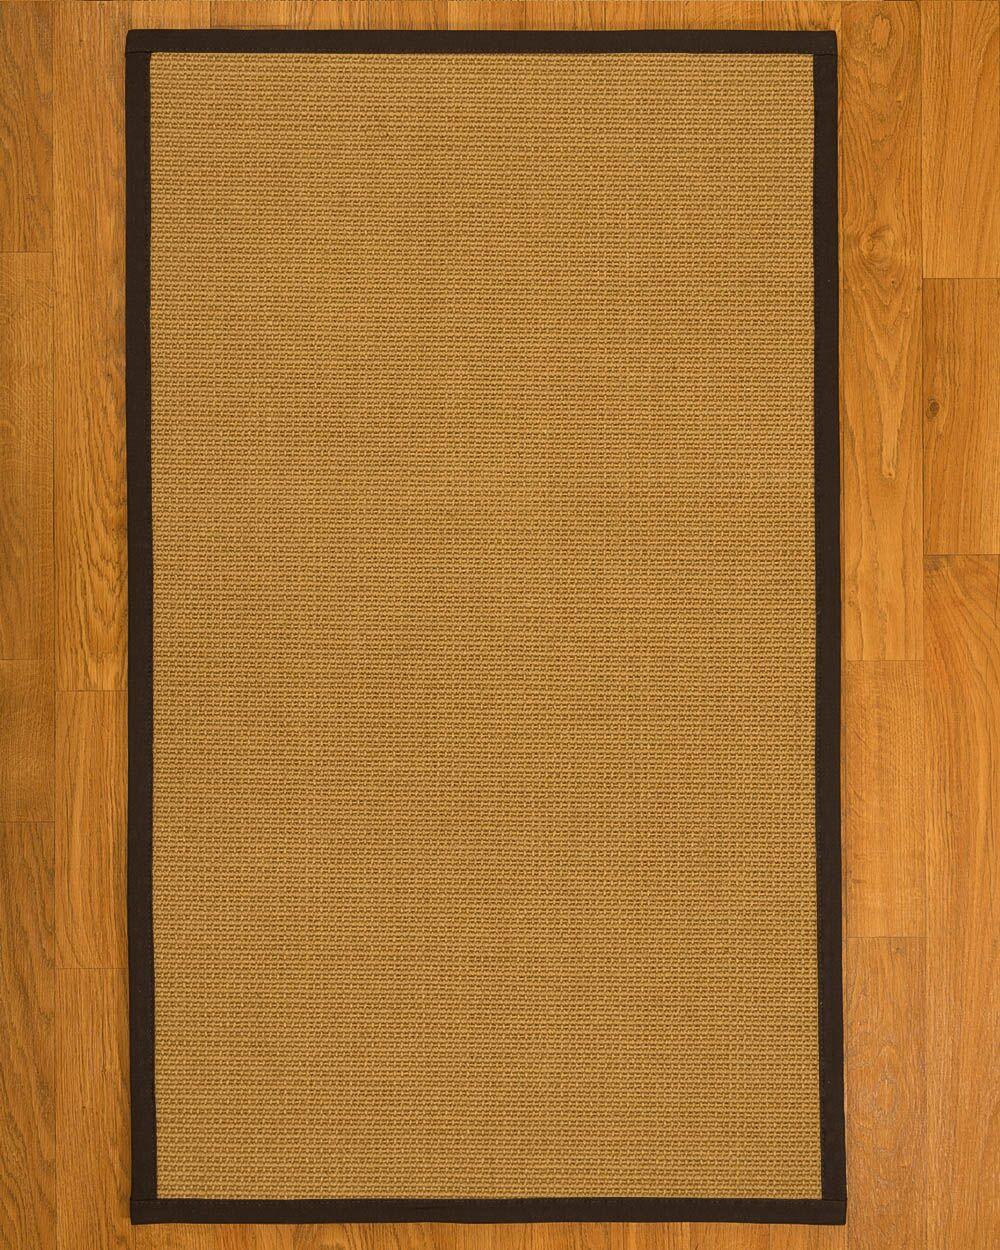 Coleridge Hand Woven Fiber Sisal Brown/Fudge Area Rug with Rug Pad Rug Size: Rectangle 8' x 10'